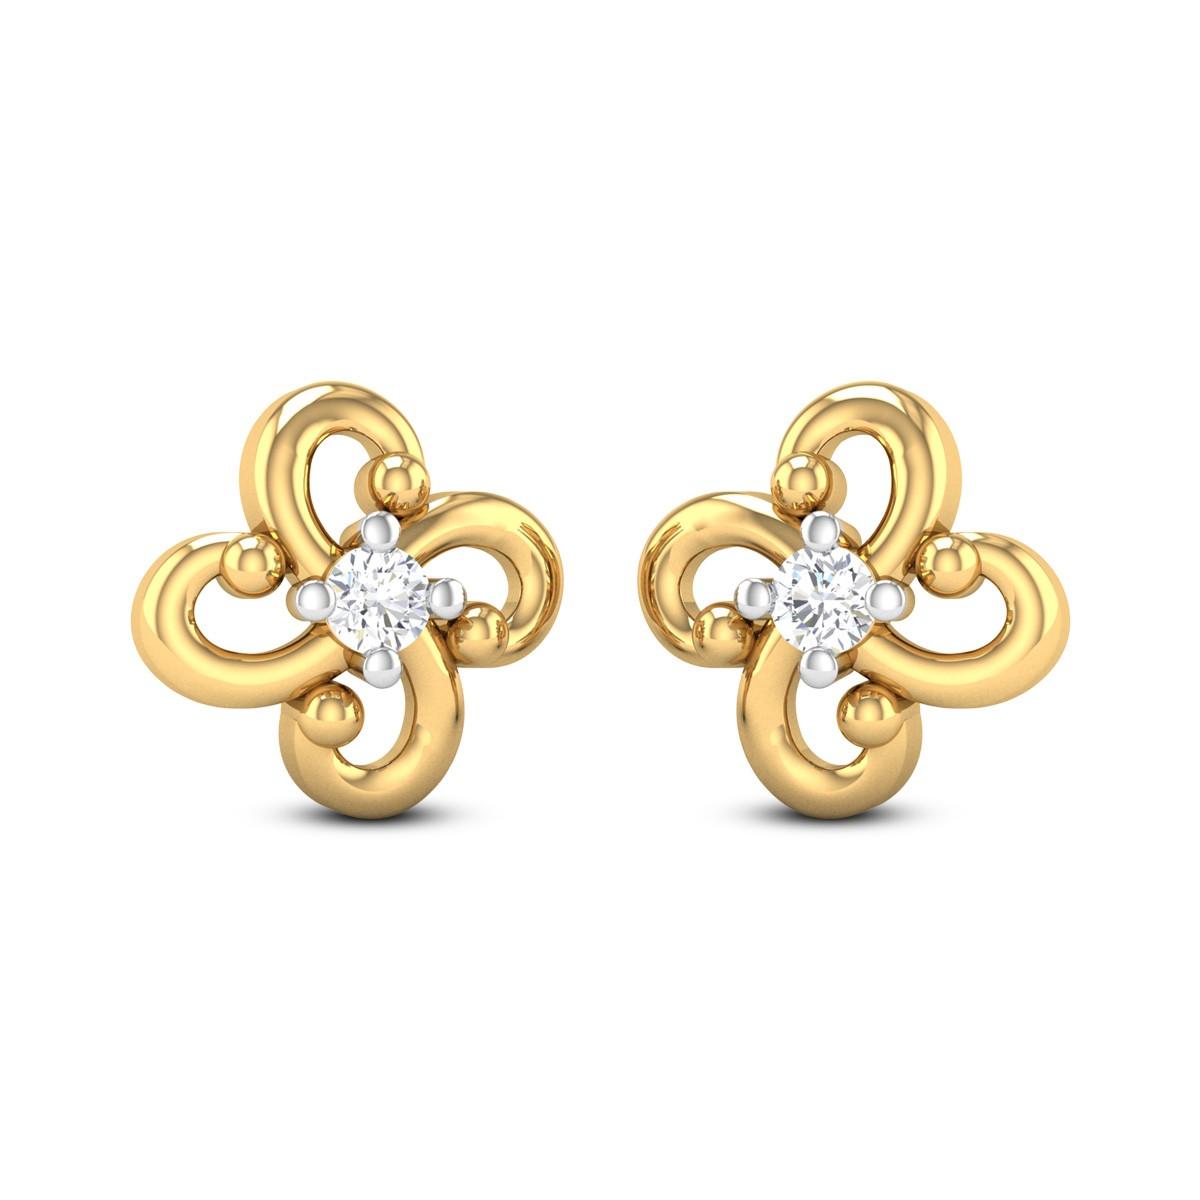 Kyle Diamond Earrings